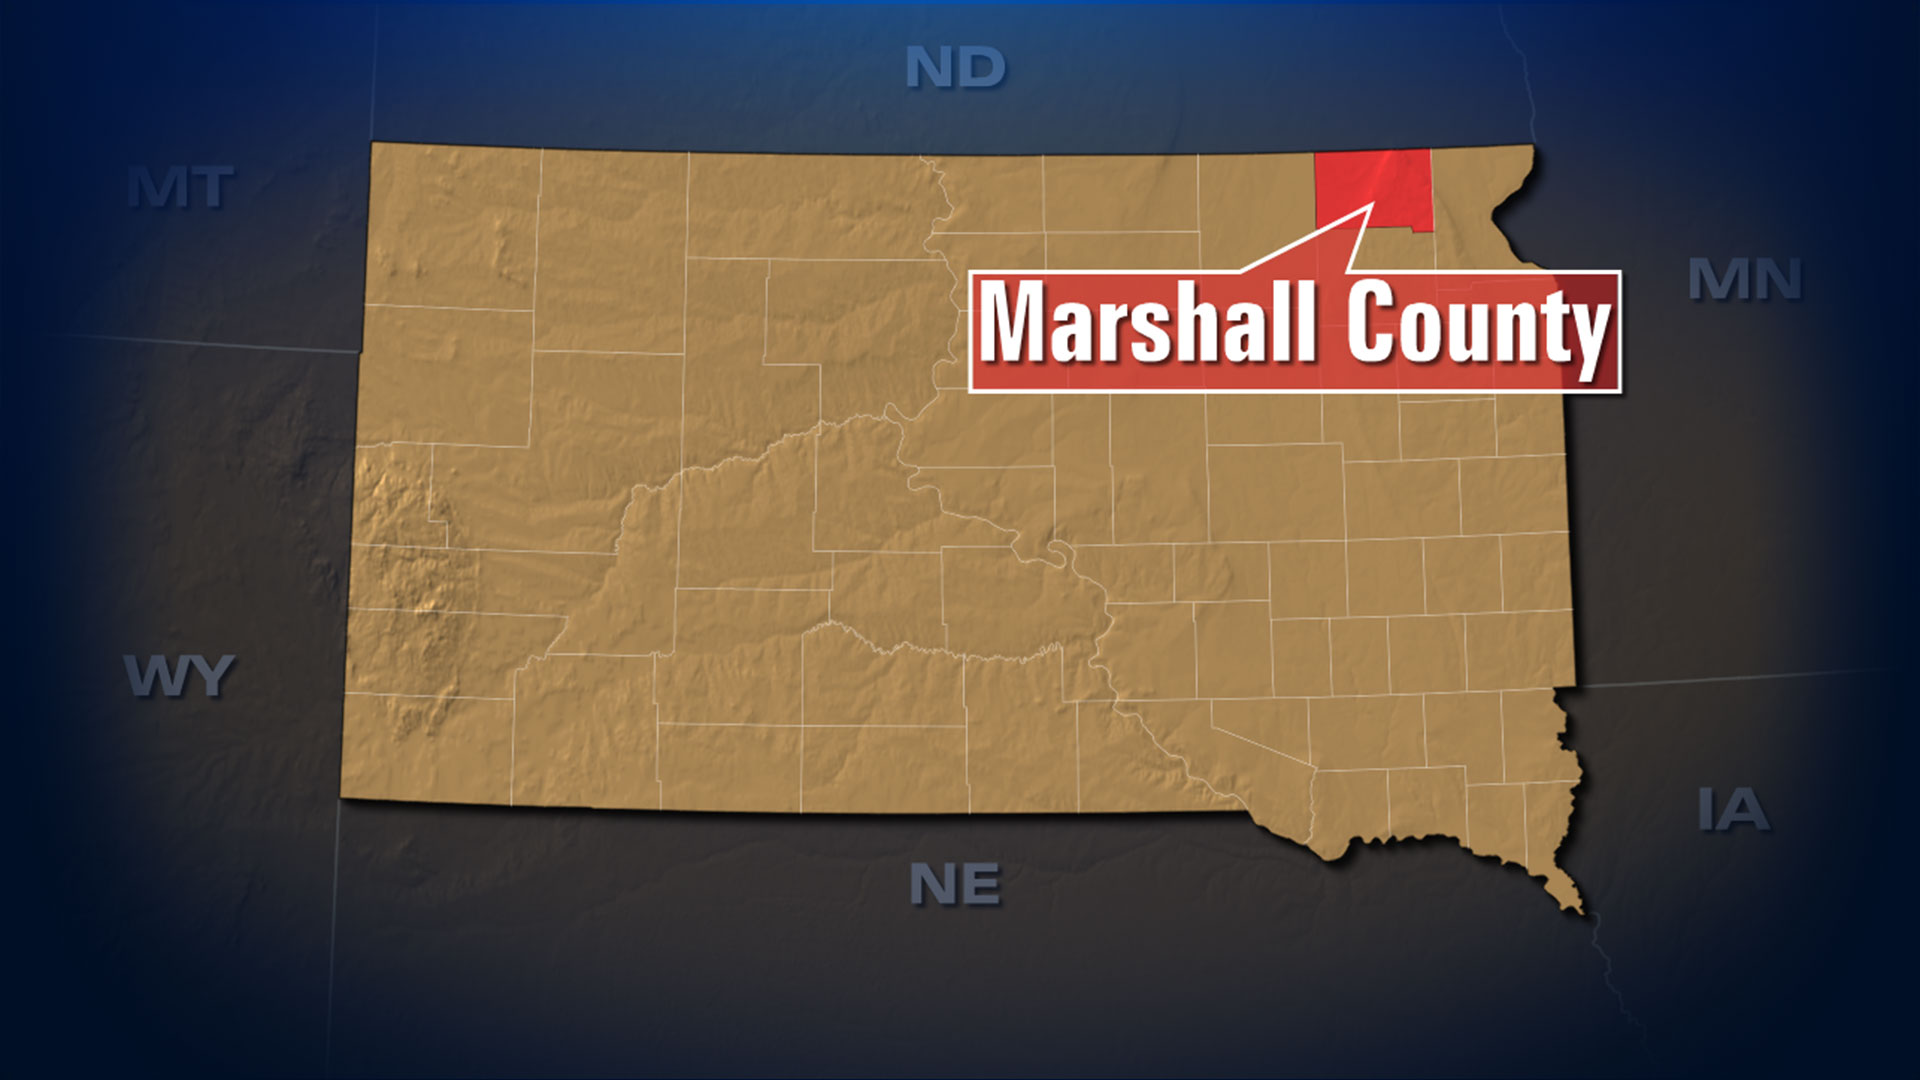 KELO Marshall County